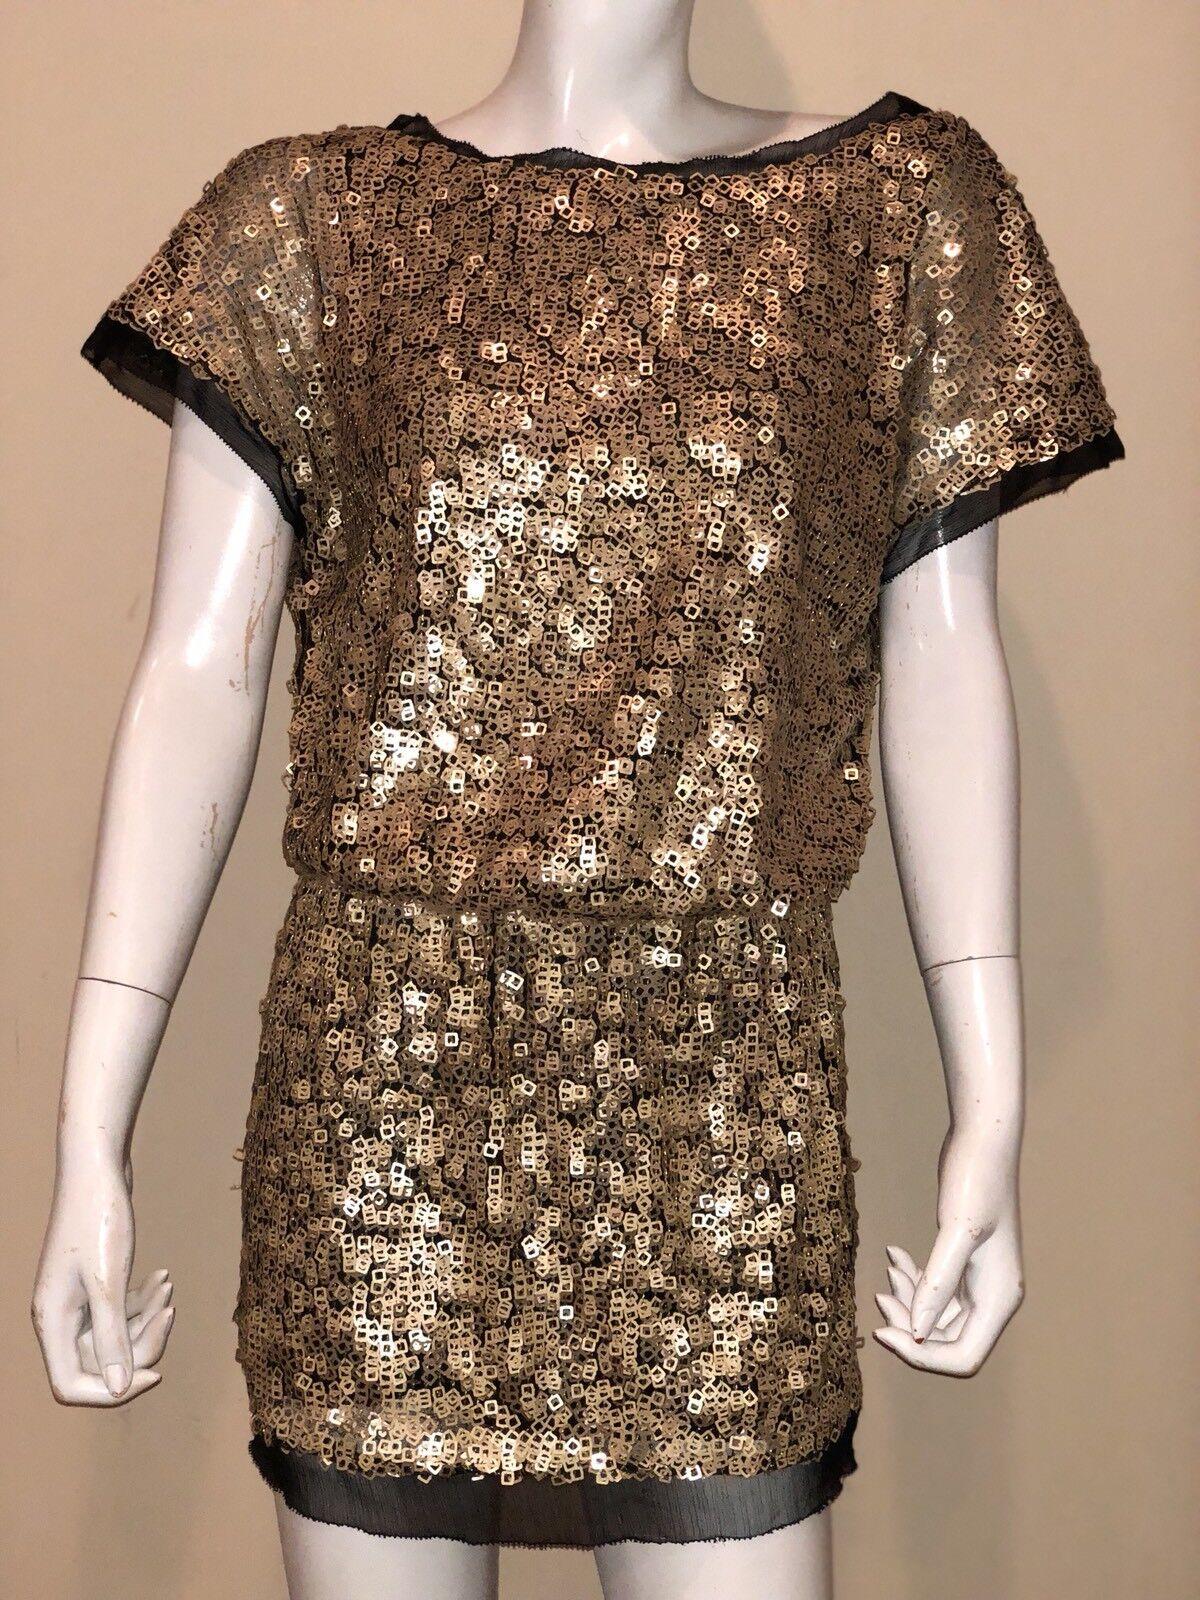 New Aidan Mattox Gold Applique Blouson Sz 0 Dress New